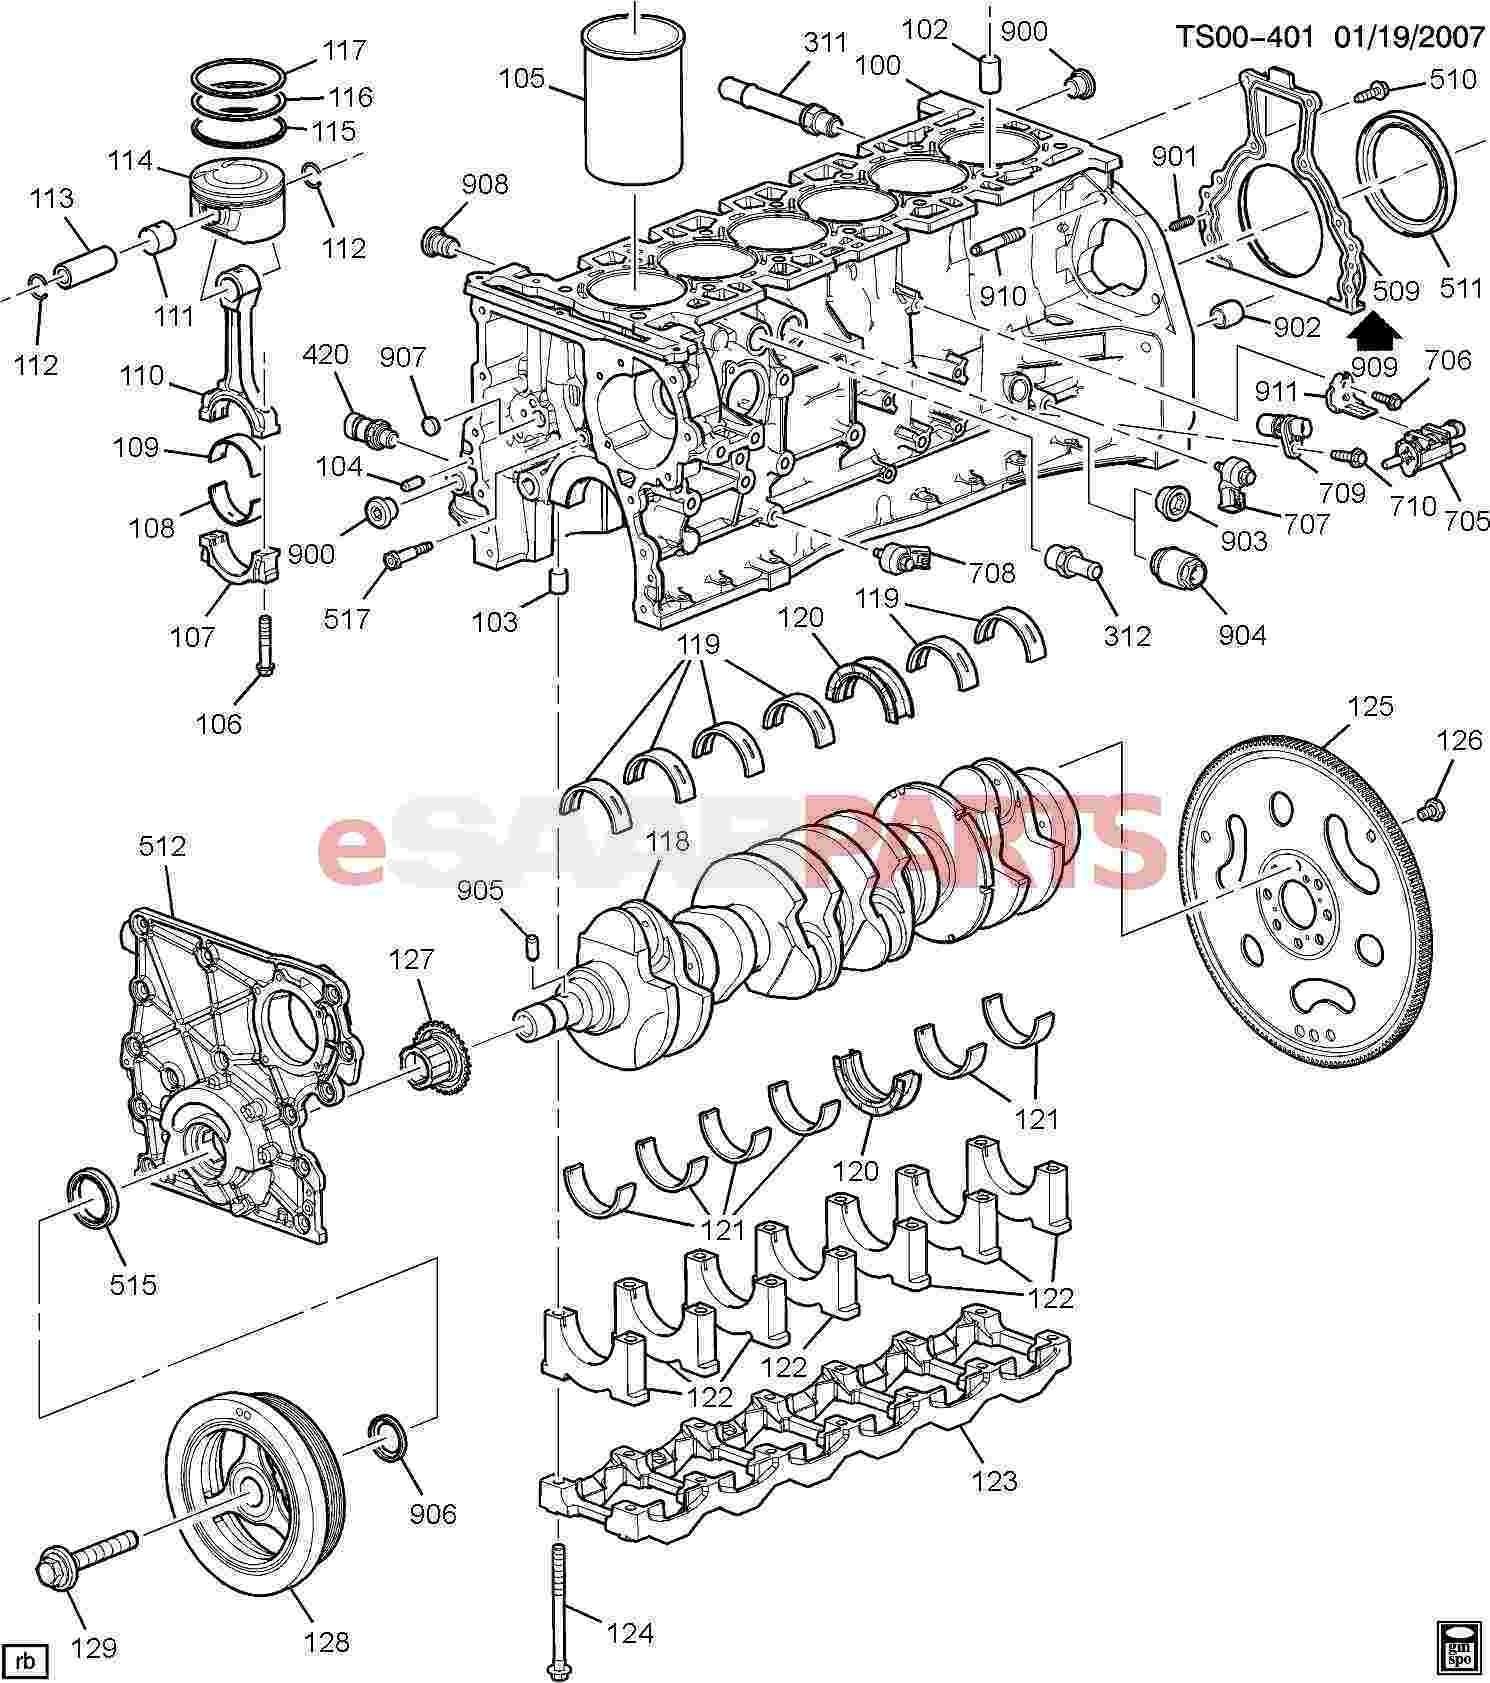 Gas Engine Parts Diagram Esaabparts Saab 9 7x Engine Parts Engine Internal 4 2s Of Gas Engine Parts Diagram